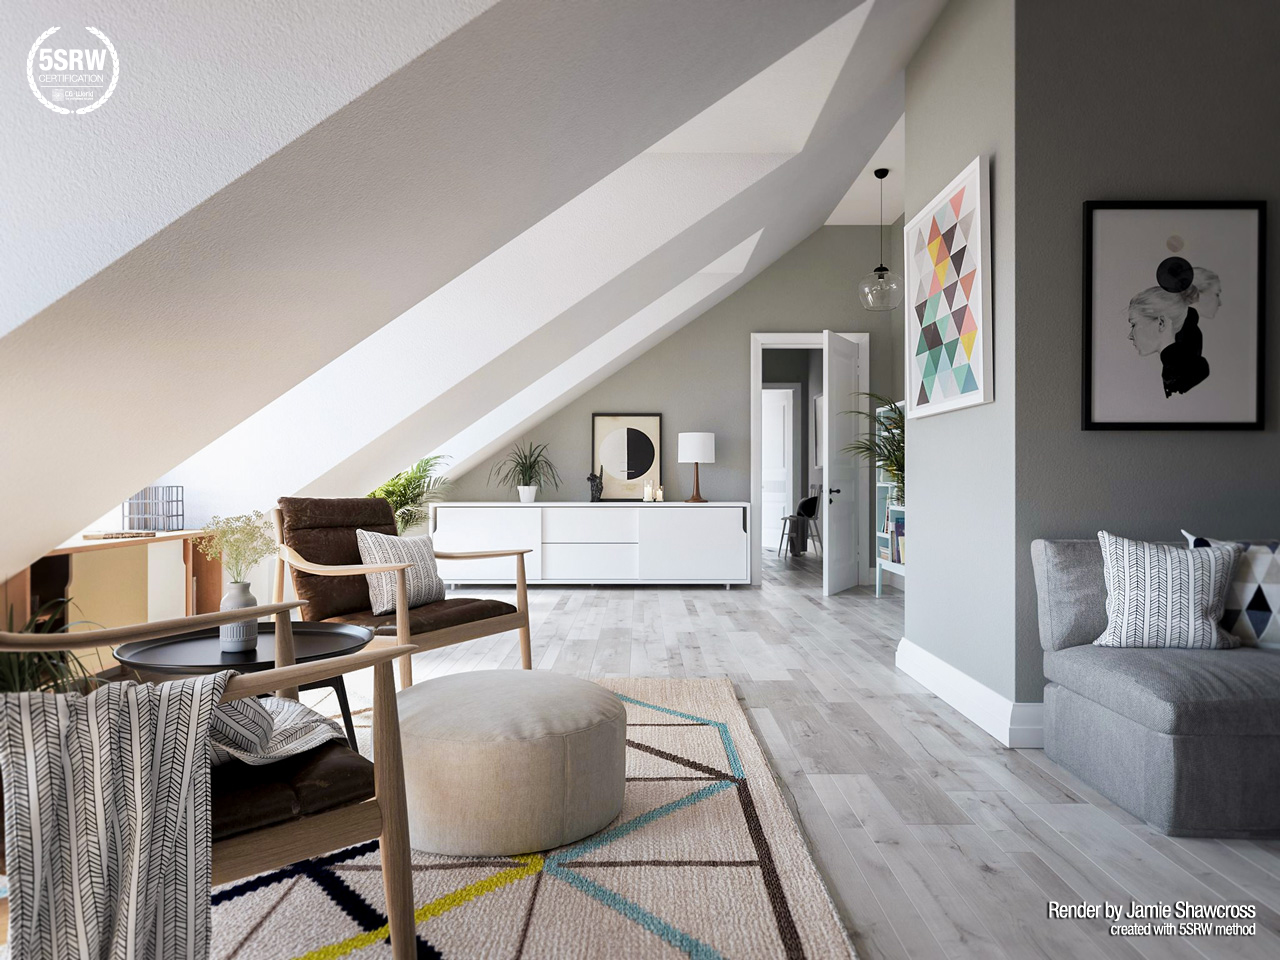 Minimal Penthouse Jamie Shawcross with 5SRW